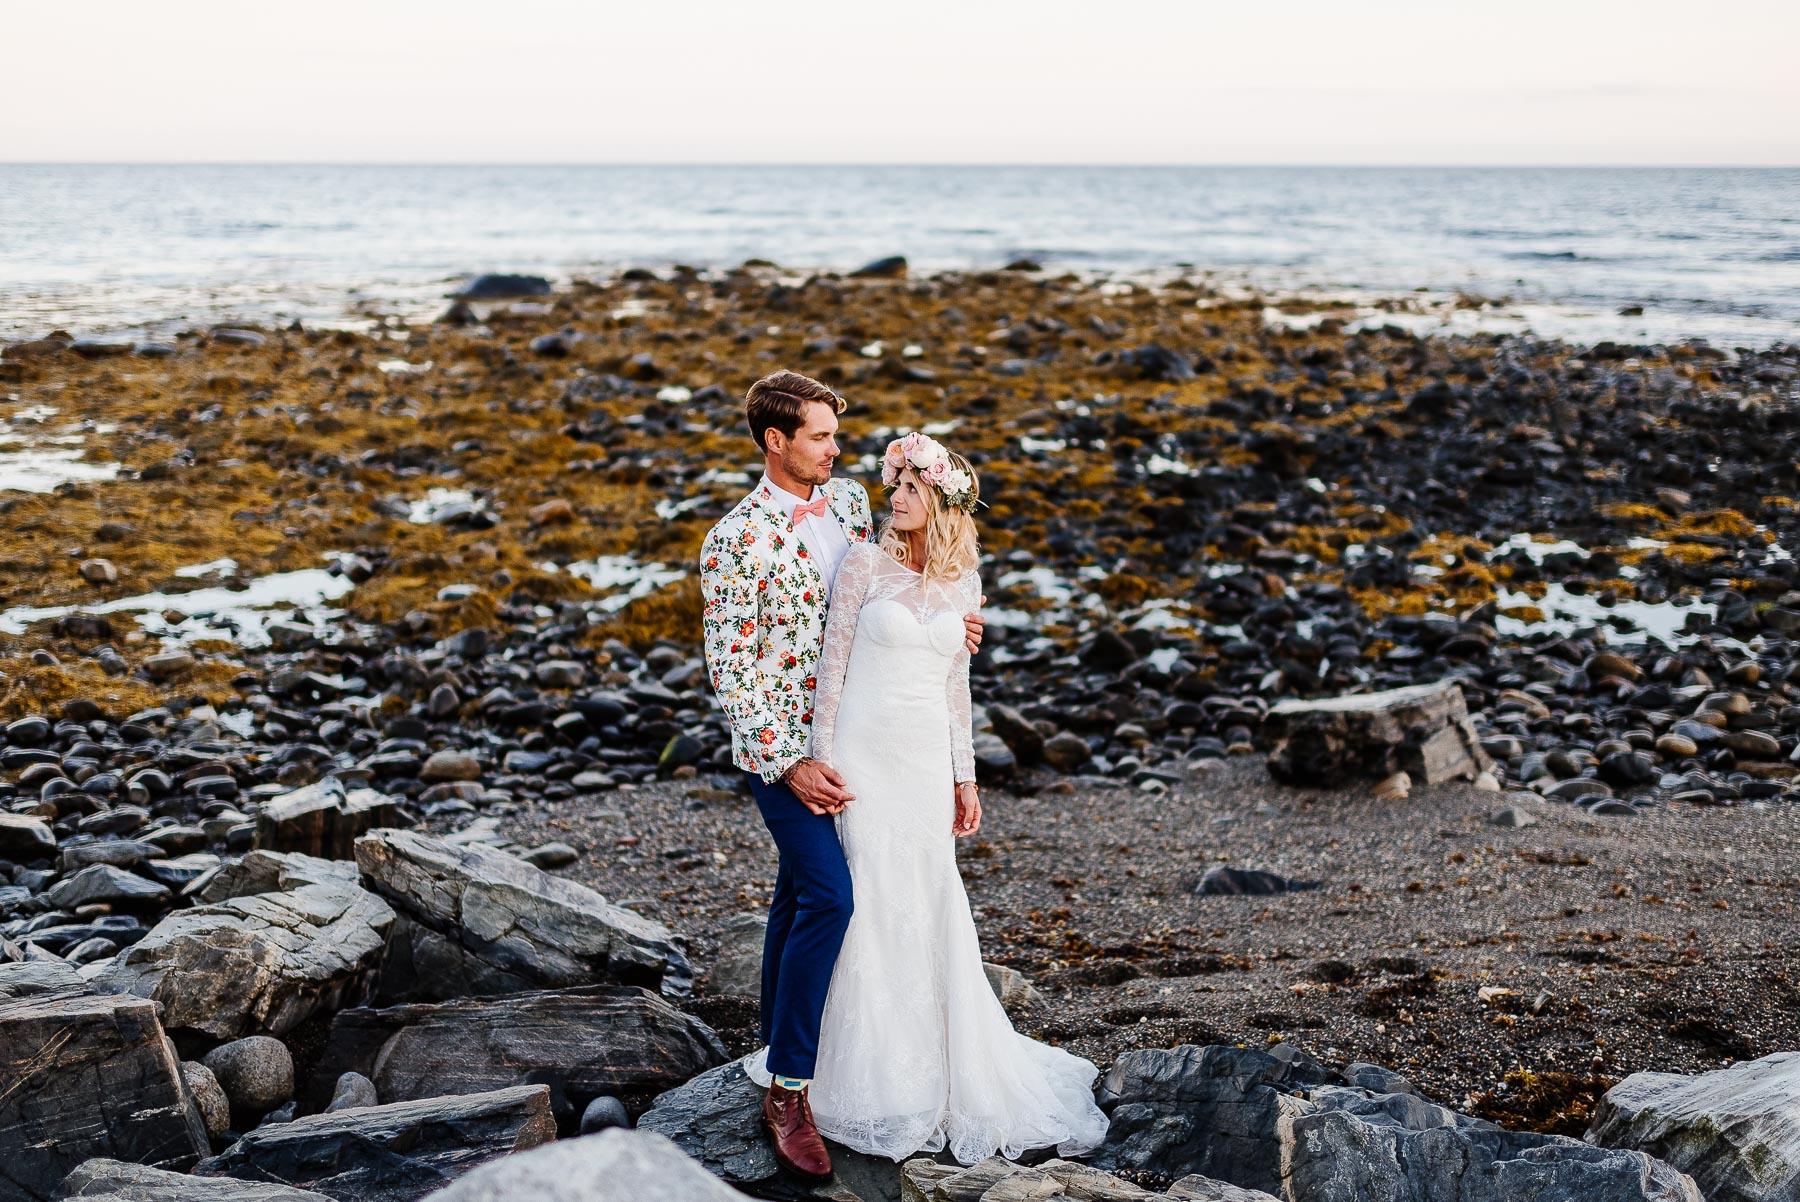 138-Bohemian New Hampshire Beach Wedding Rye New Hampshire Weddings Summer Sessions Surf Shop Longbrook Photography.jpg